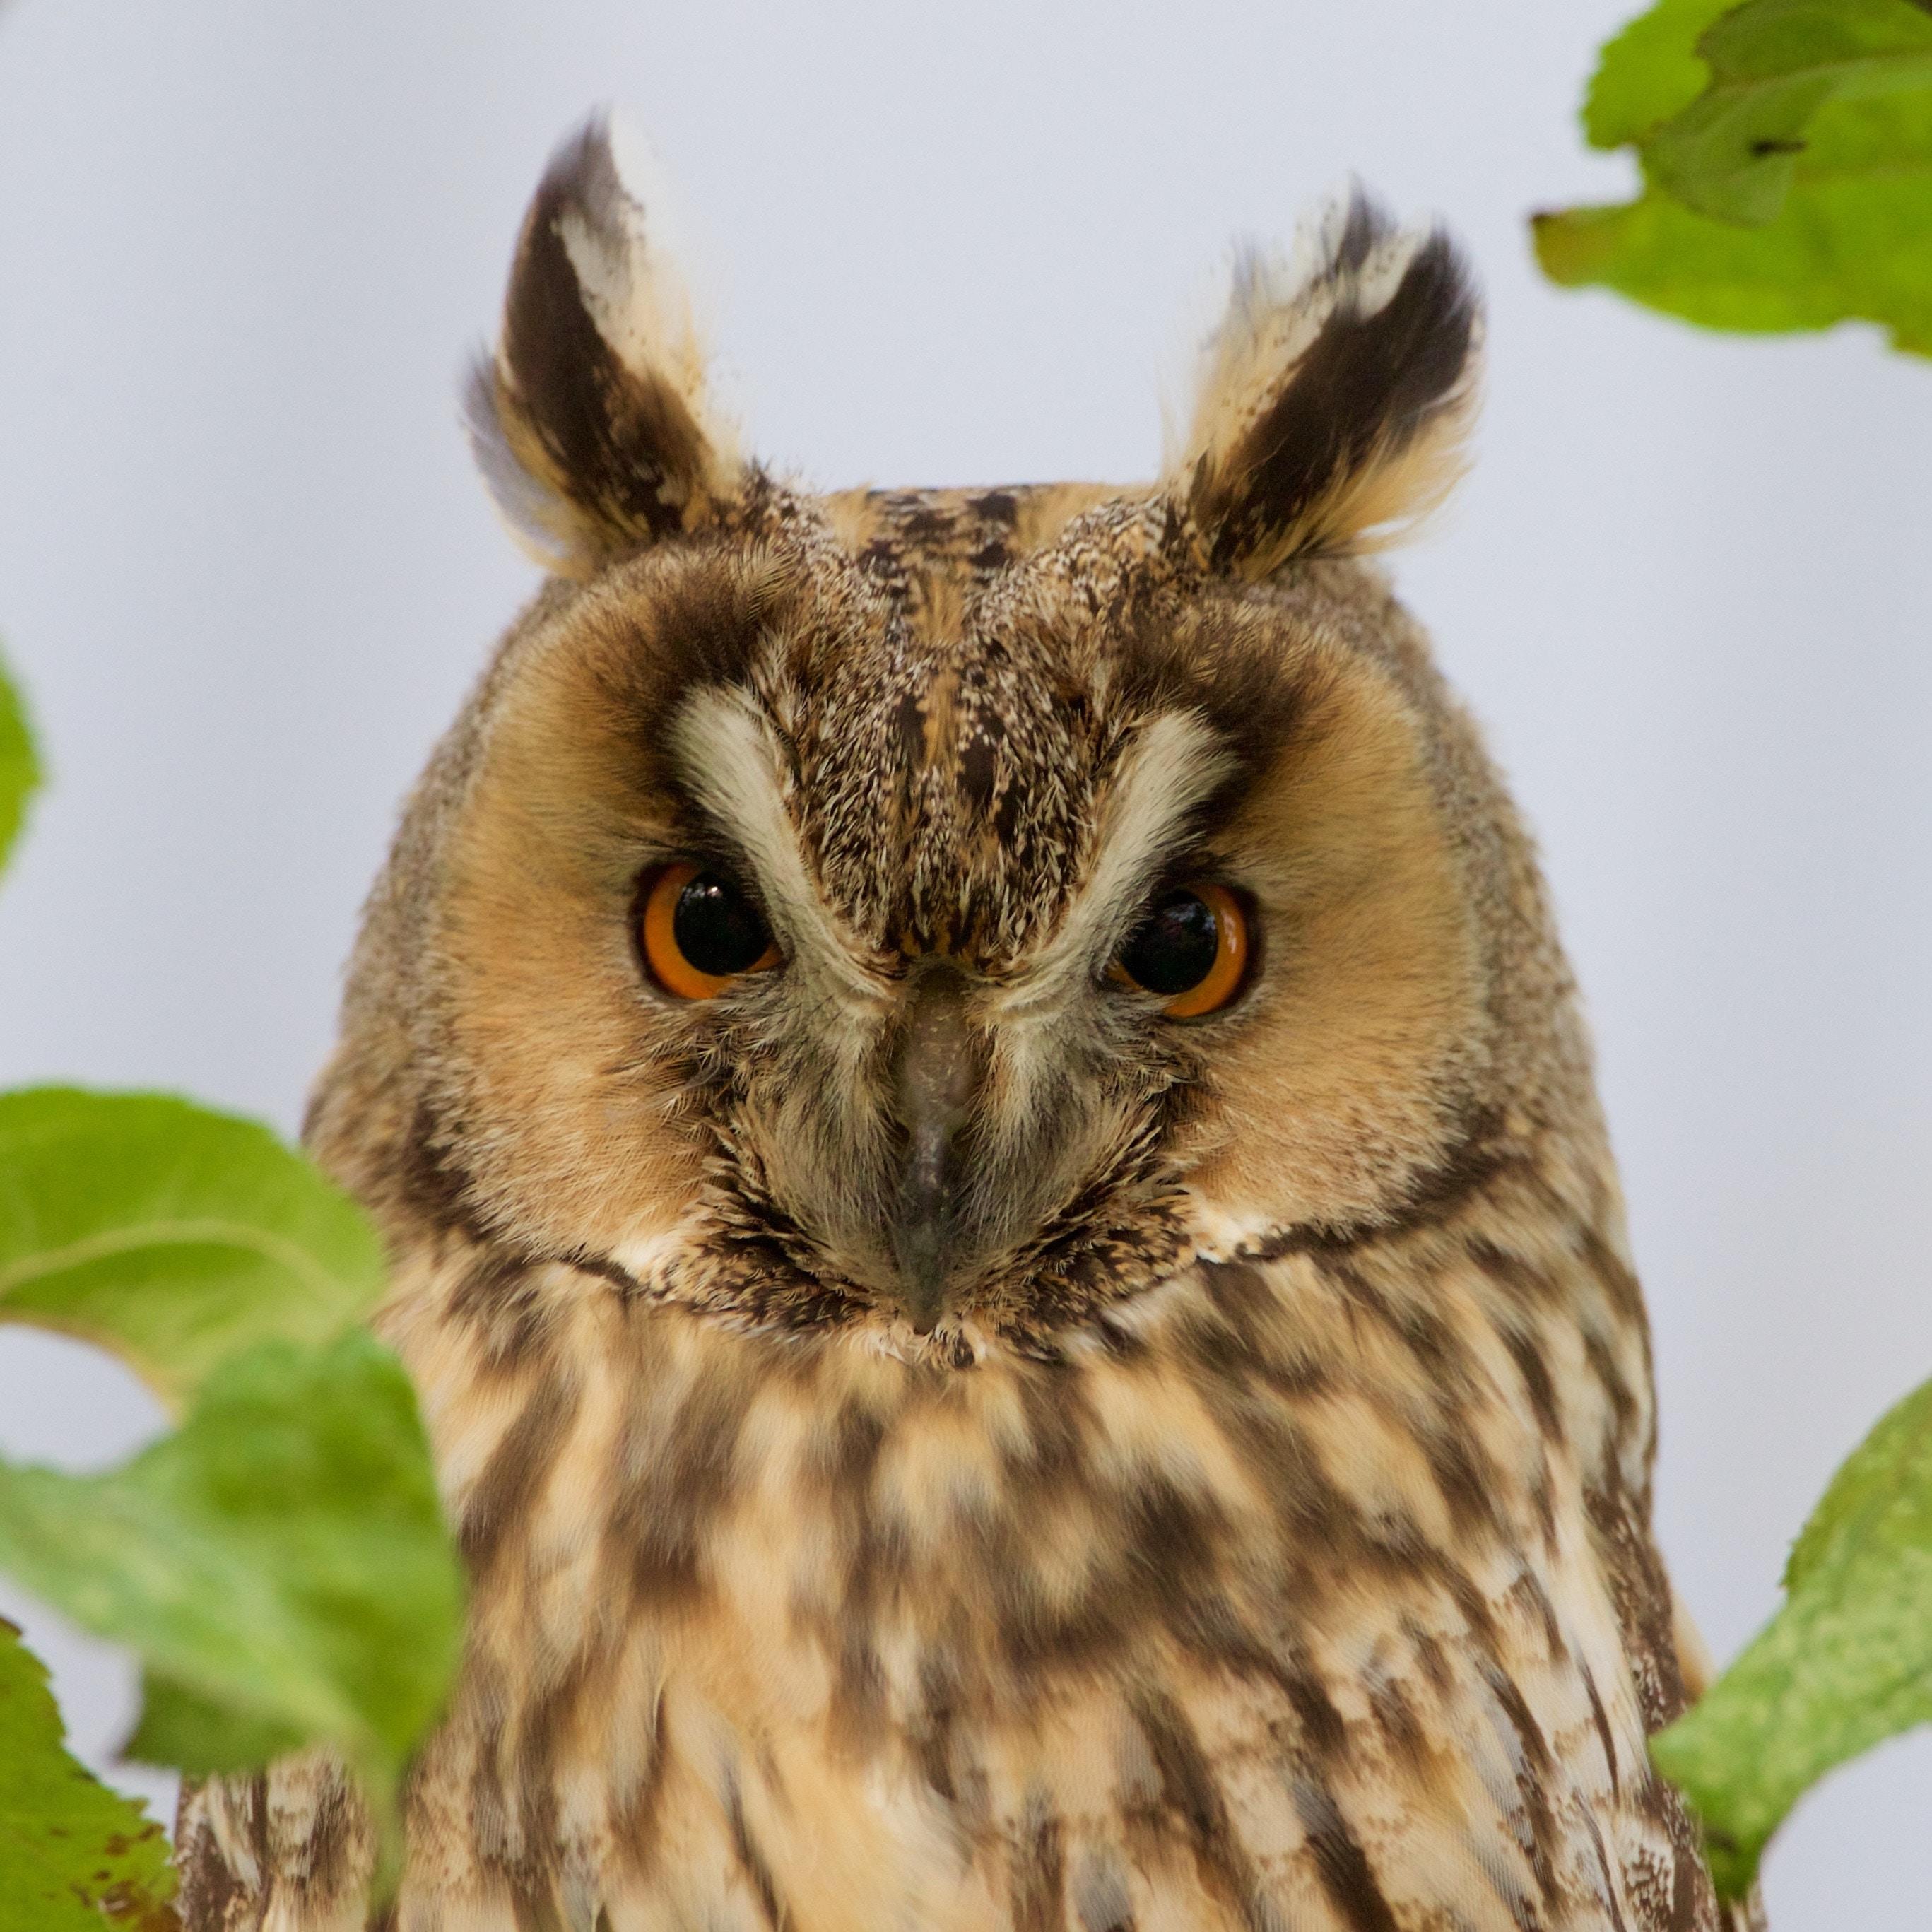 brown owl in tilt-shift photography